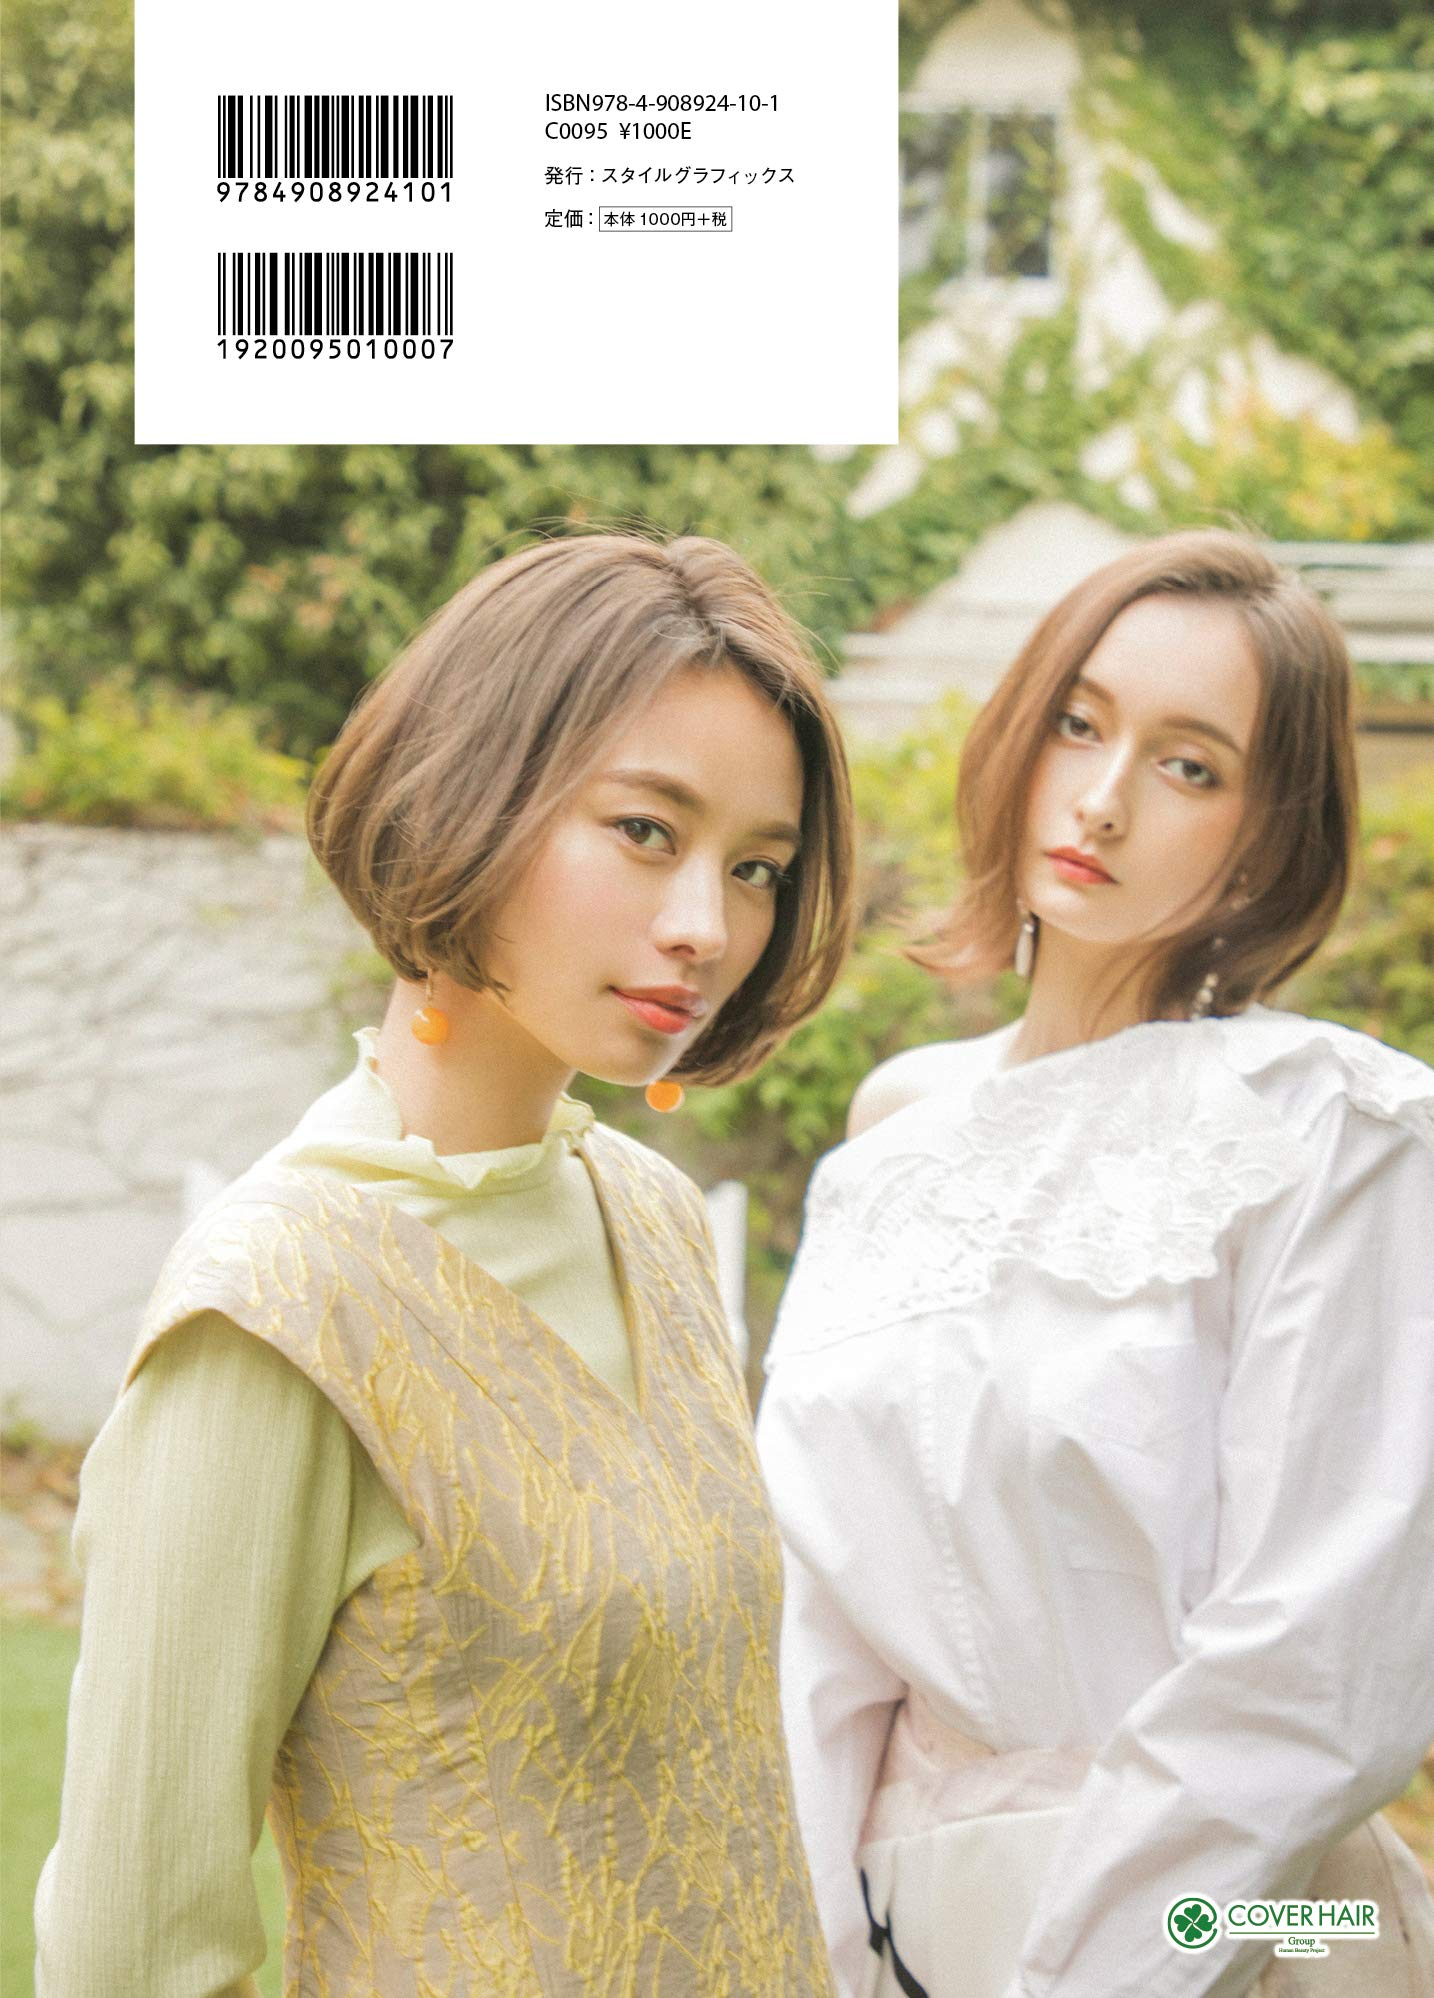 COVER hair's magazine 2020